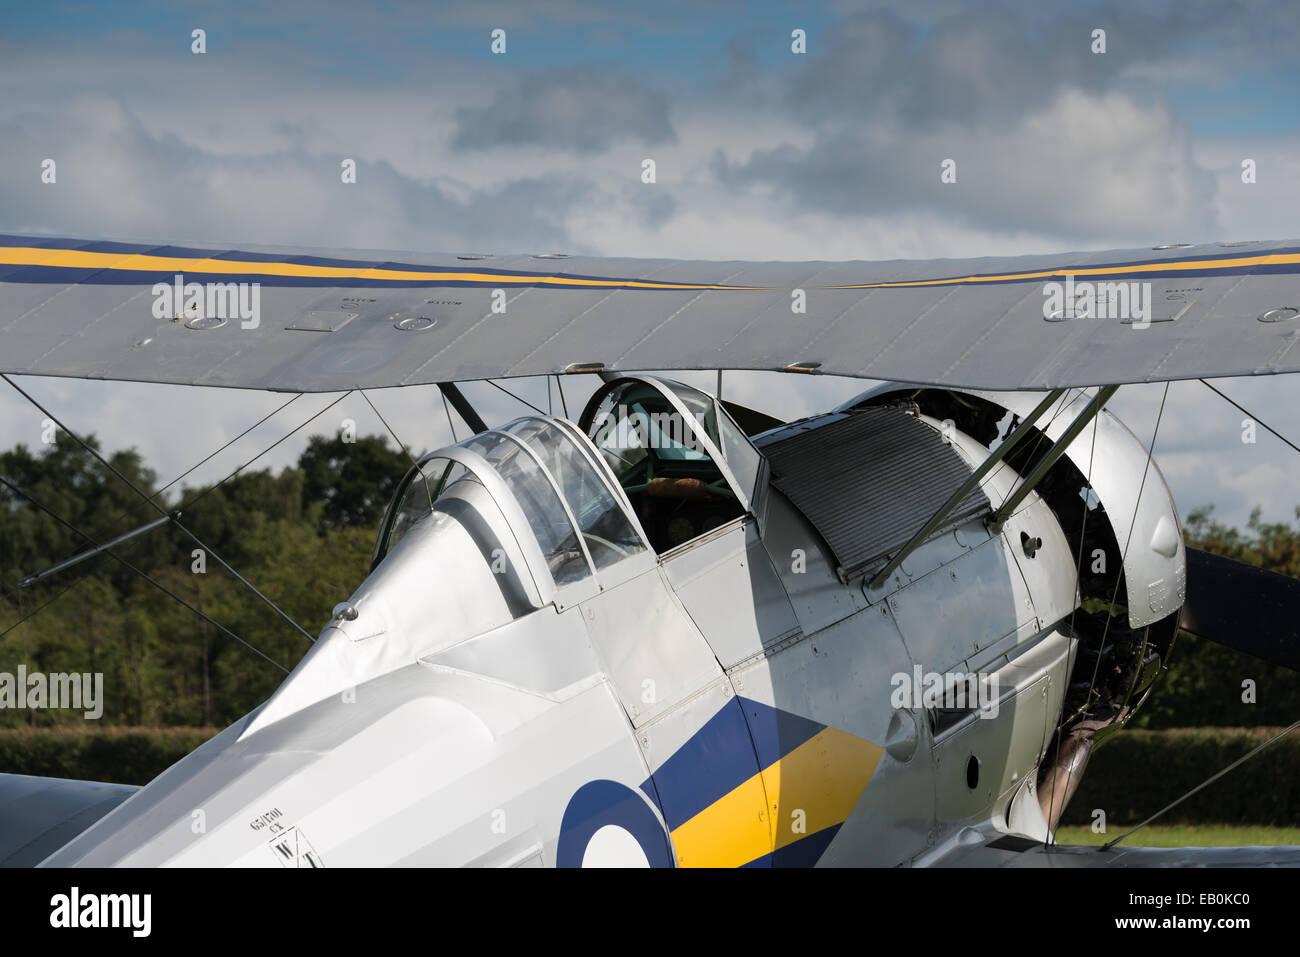 Biggleswade, UK - 29 June 2014: A  vintage  Gloster Gladiator bi-plane on display at the Shuttleworth Collection - Stock Image